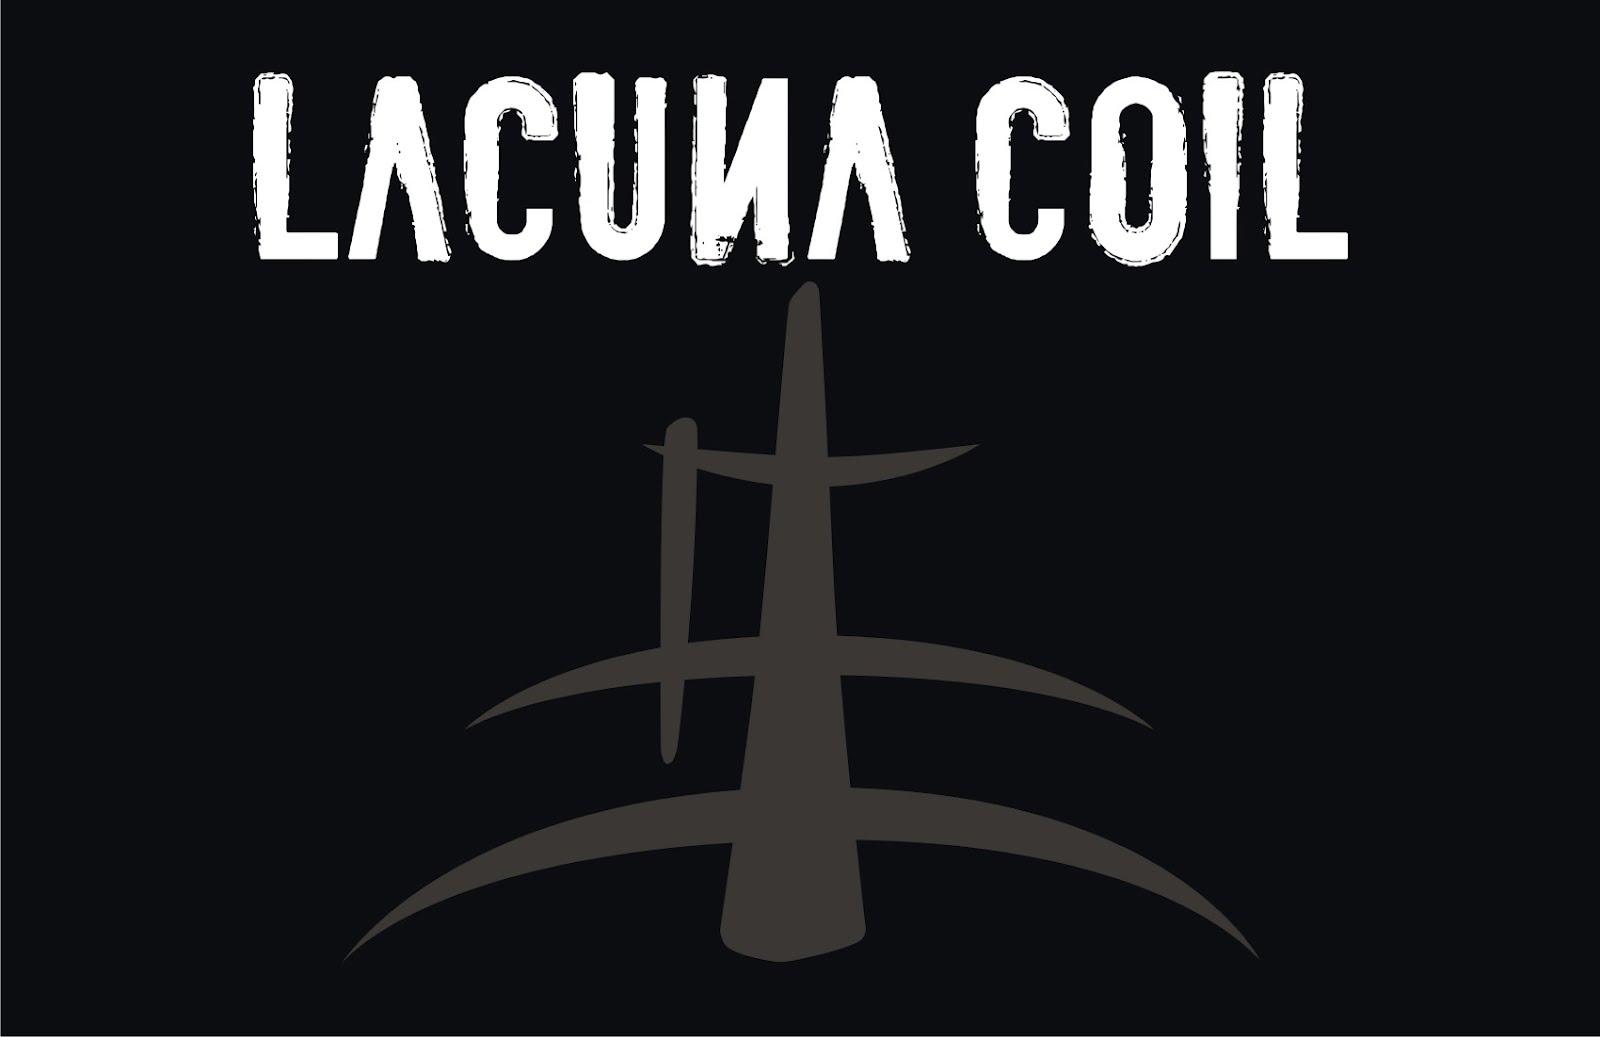 lacuna_coil-symbol_back_vector